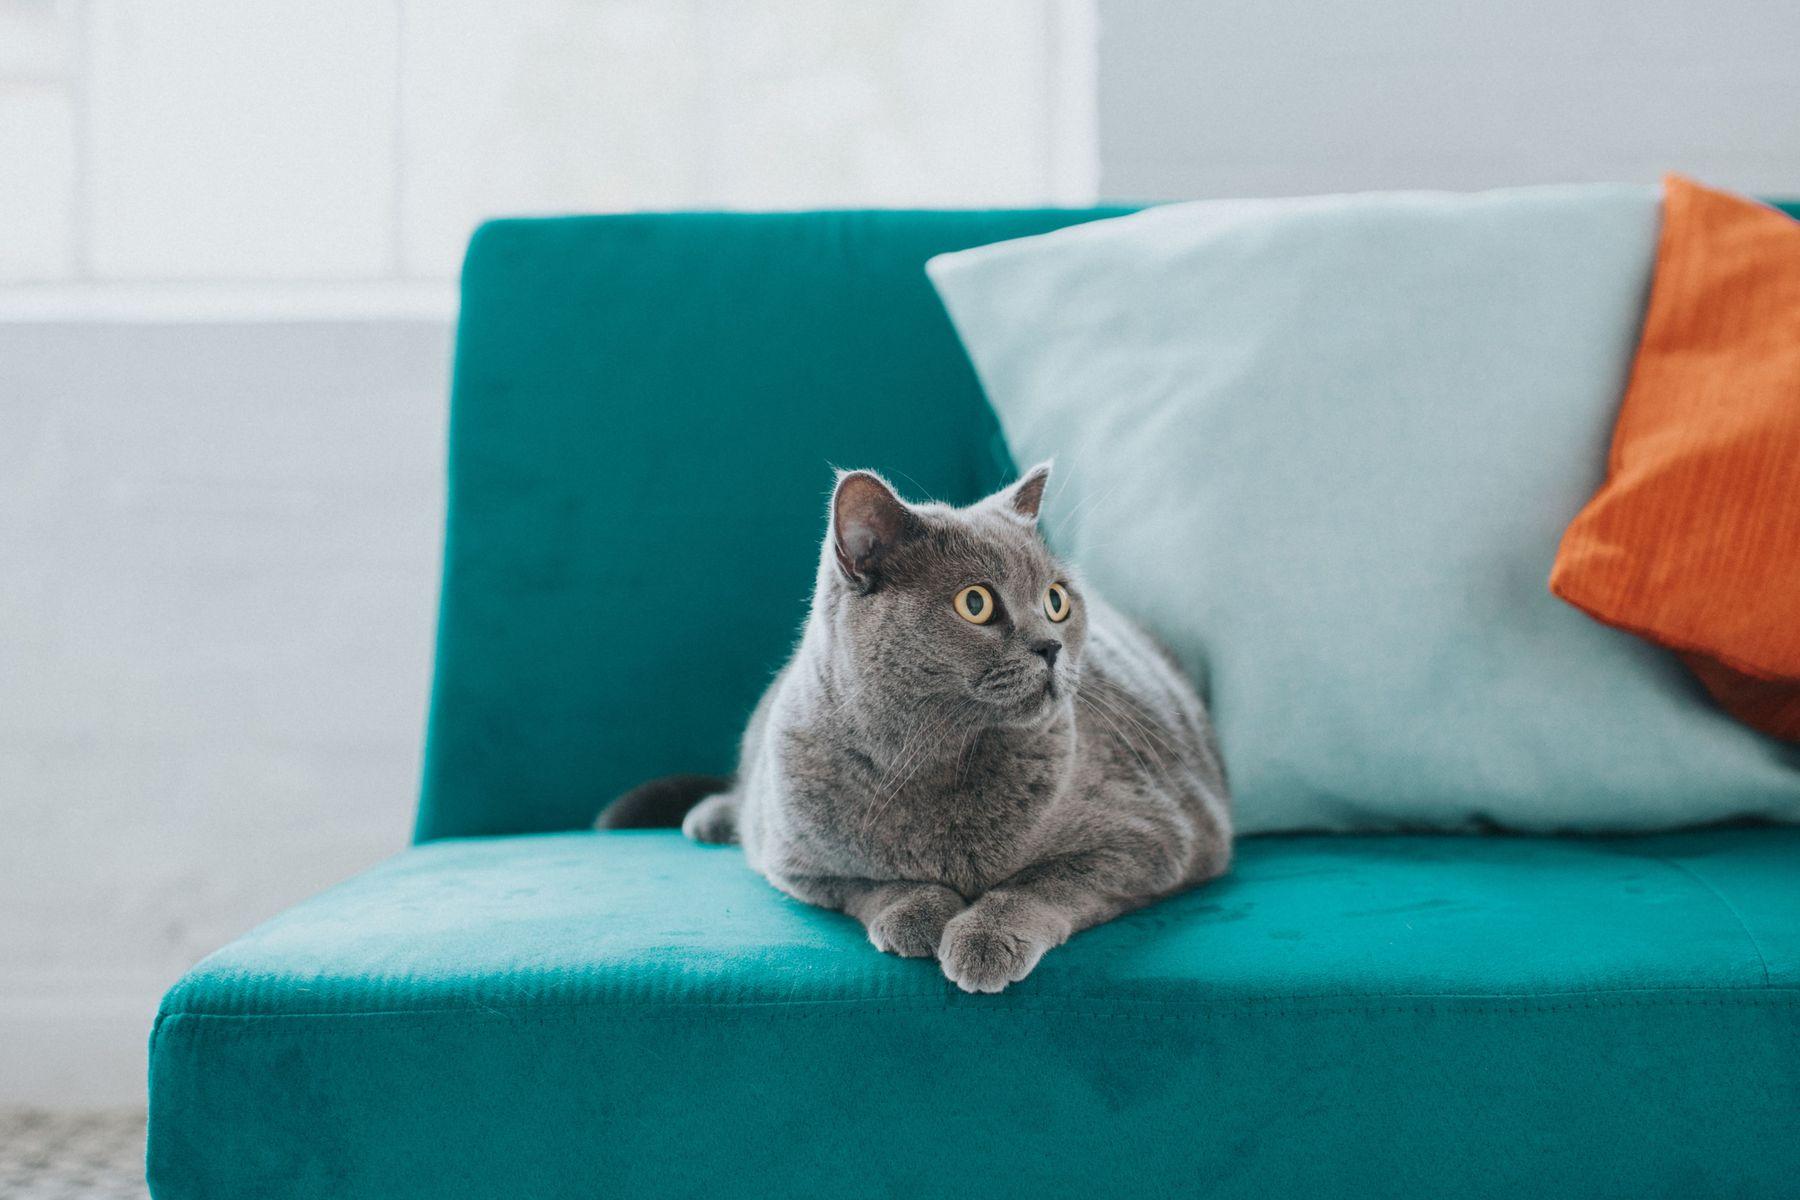 gato cinza deitado sobre sofá verde com almofada laranja